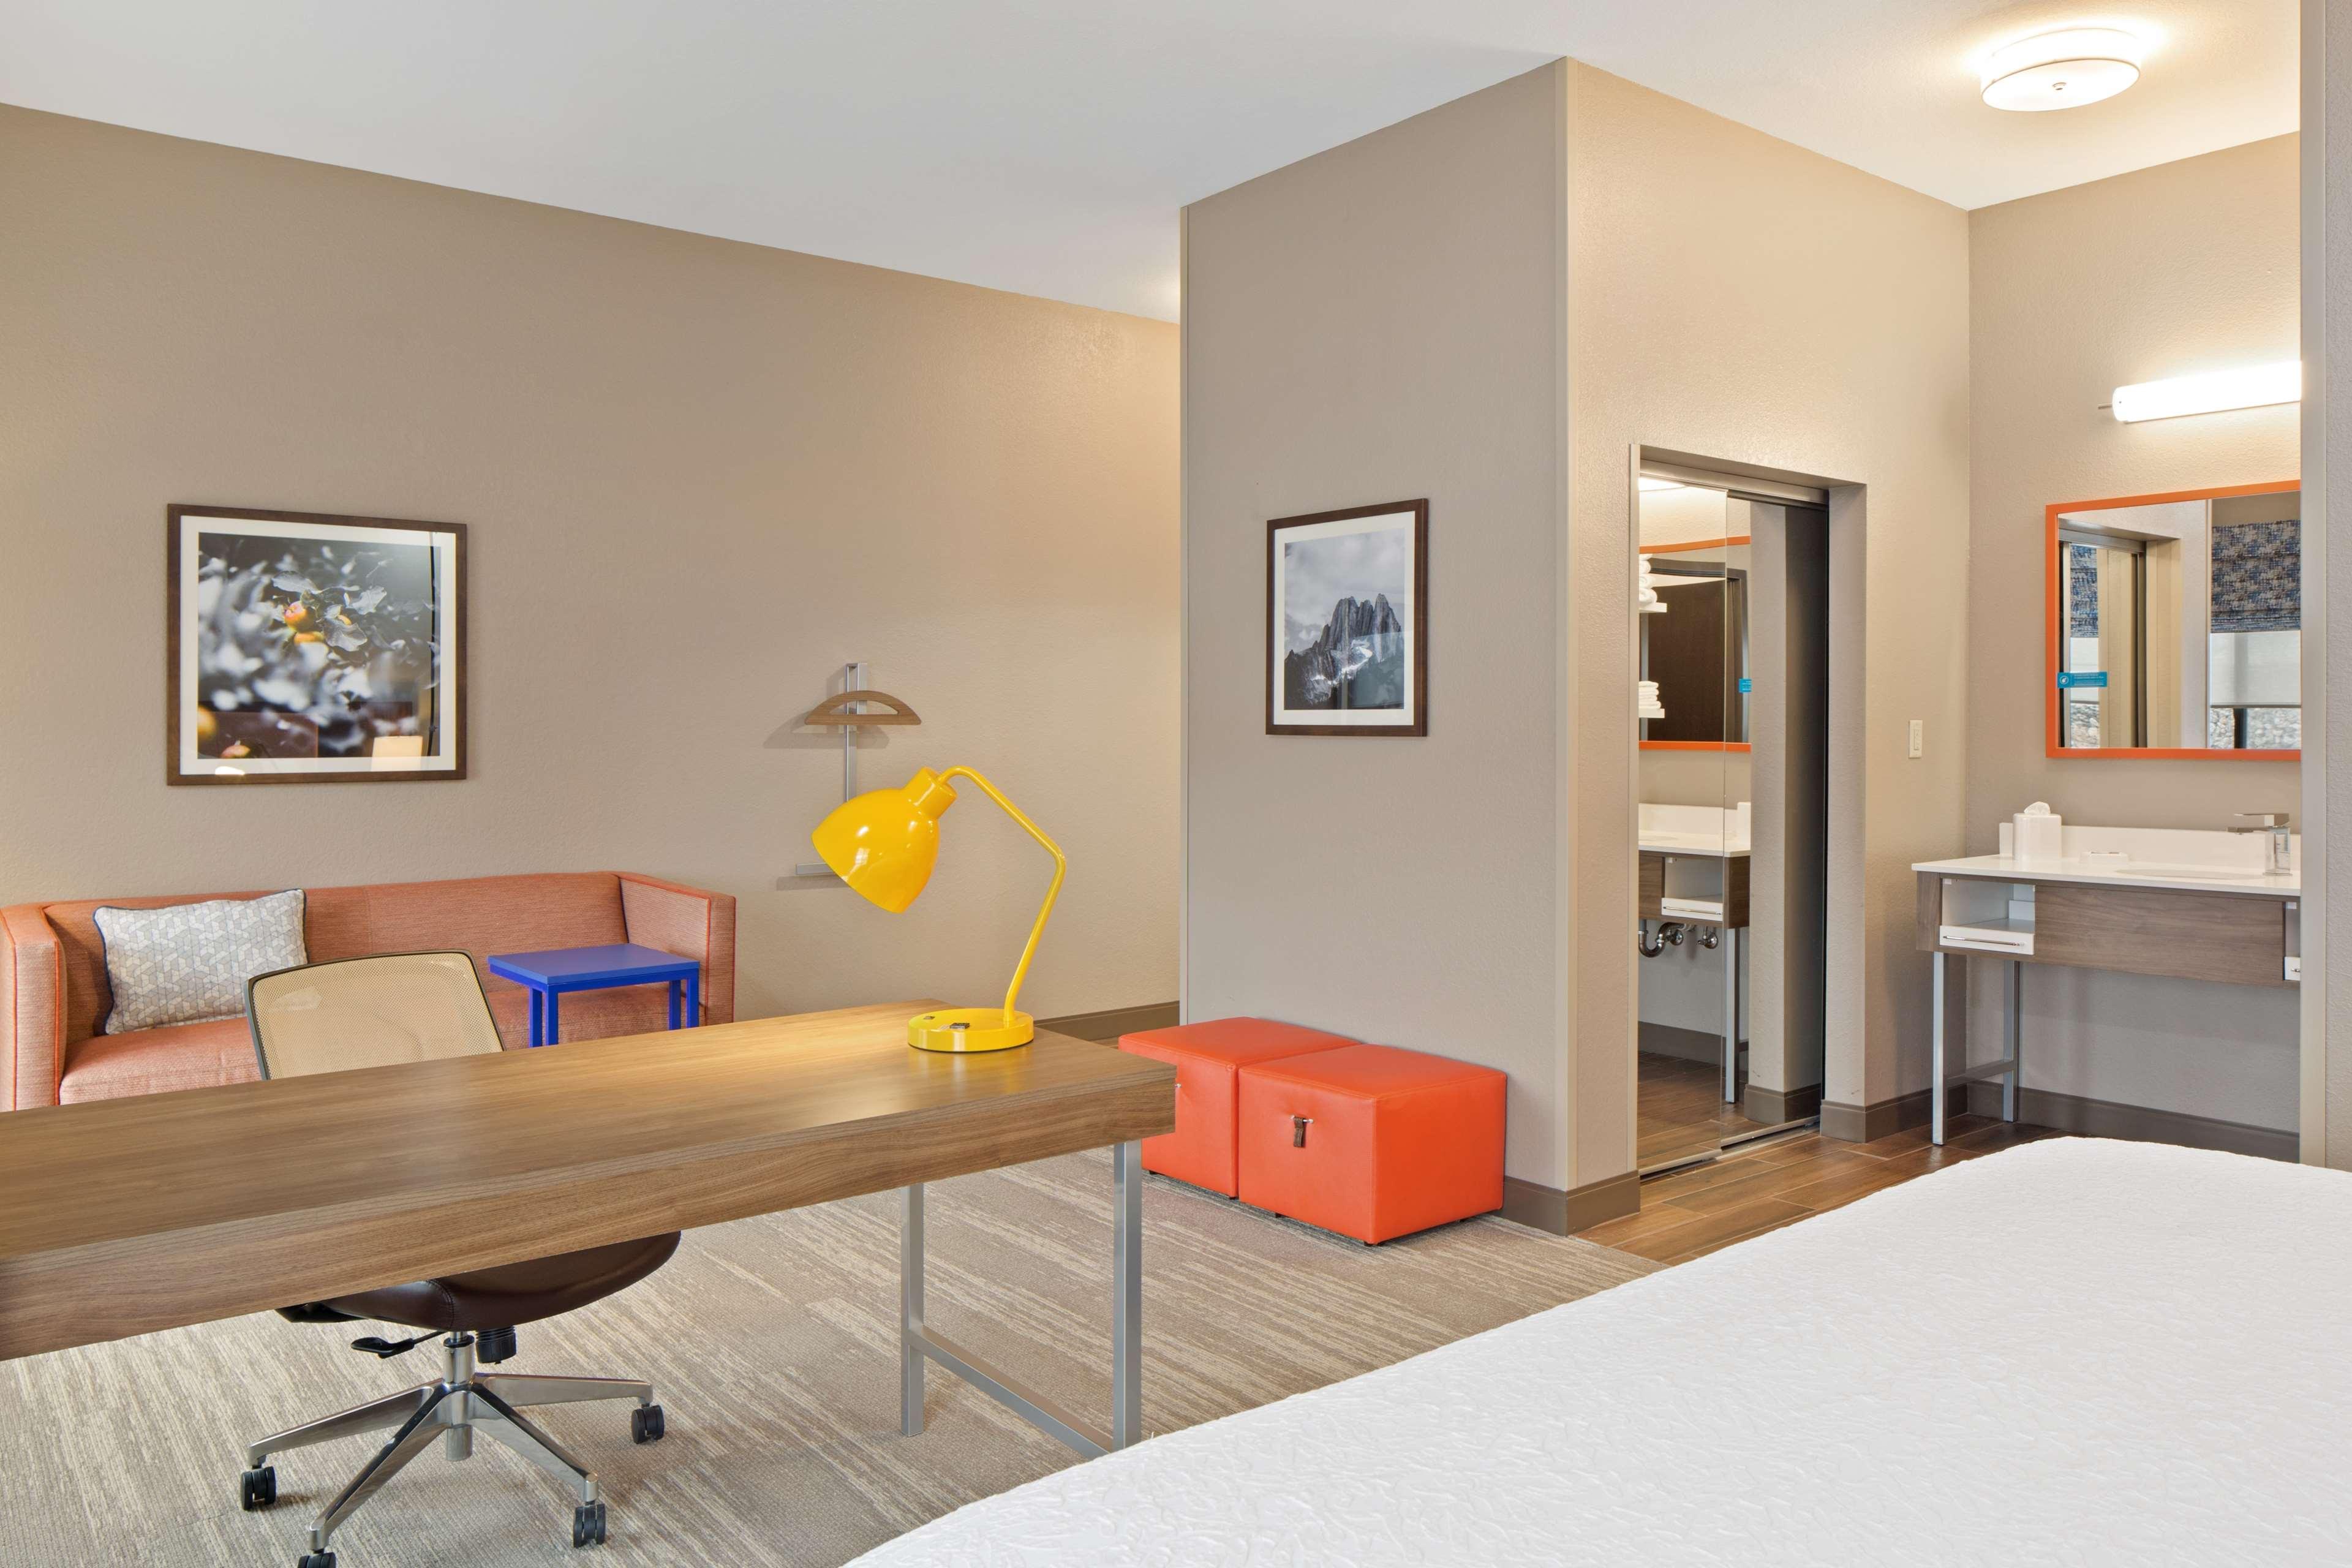 Hampton Inn & Suites Spokane Valley image 27